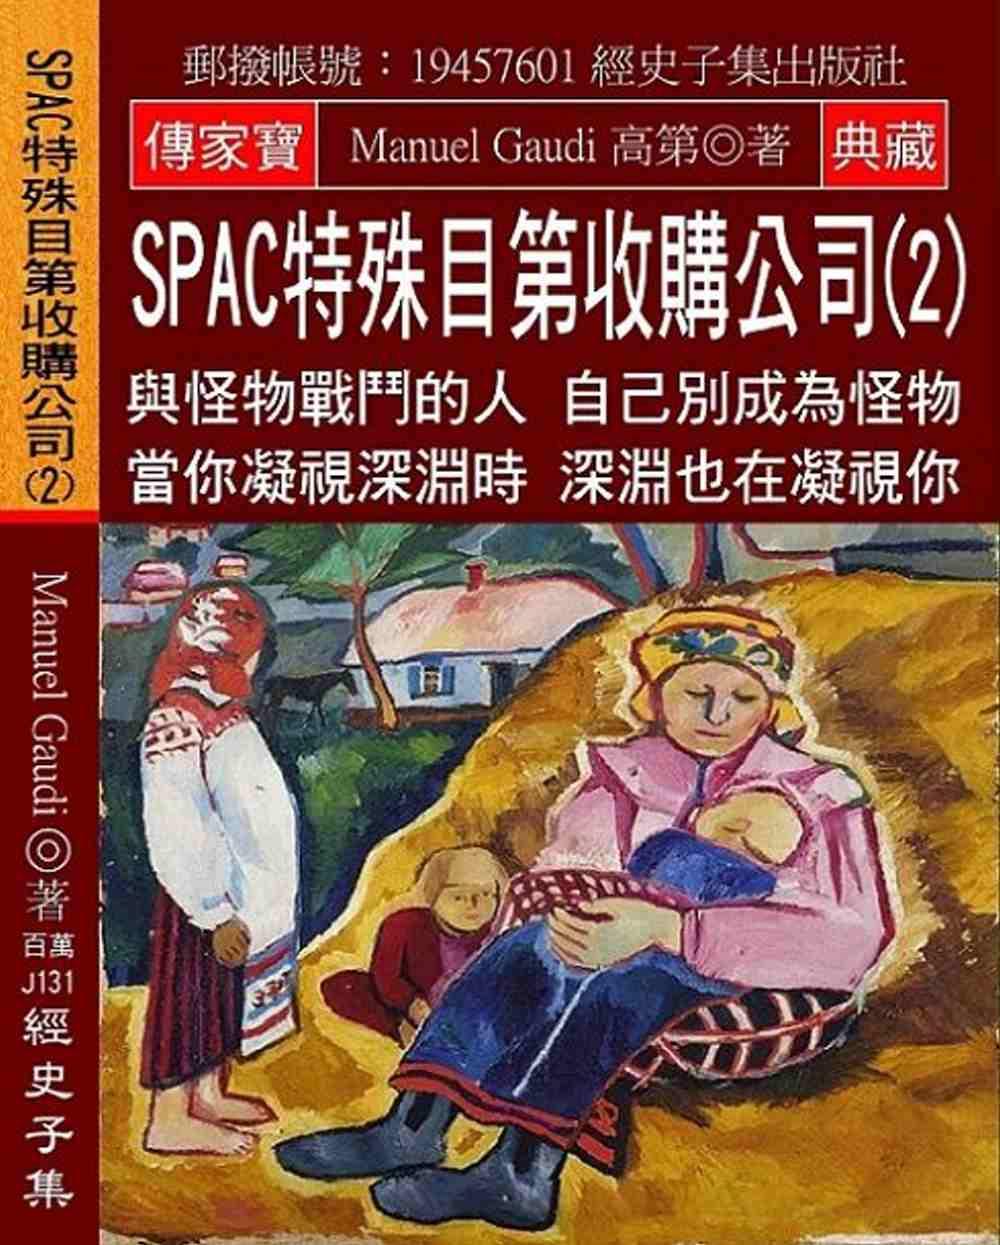 SPAC特殊目第收購公司(2)...